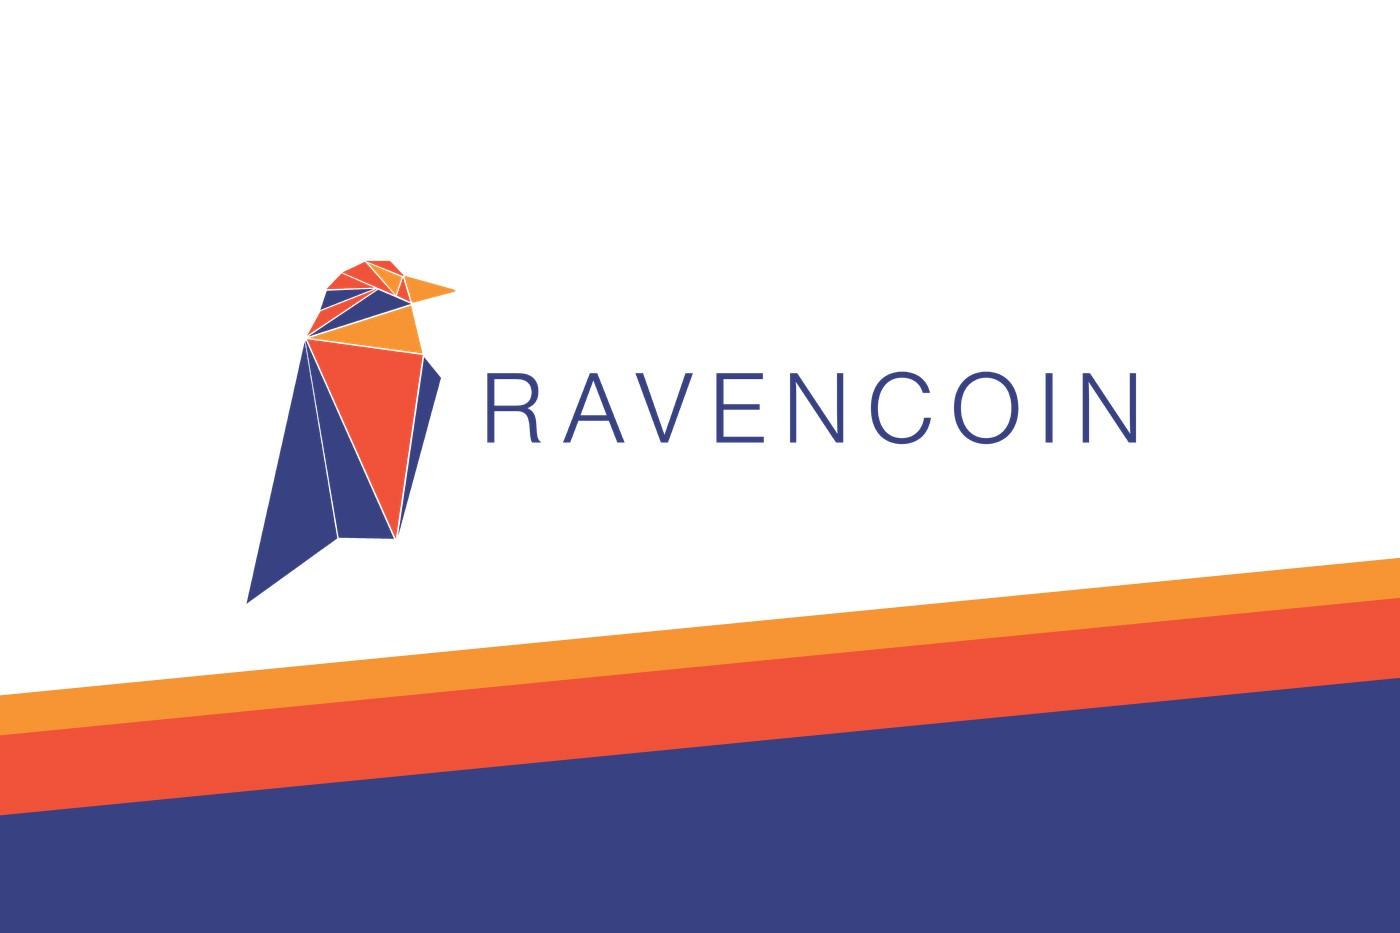 Ravencoin 1 Ayda 10 Kat Değerlendi. Paribu Kilitlendi.